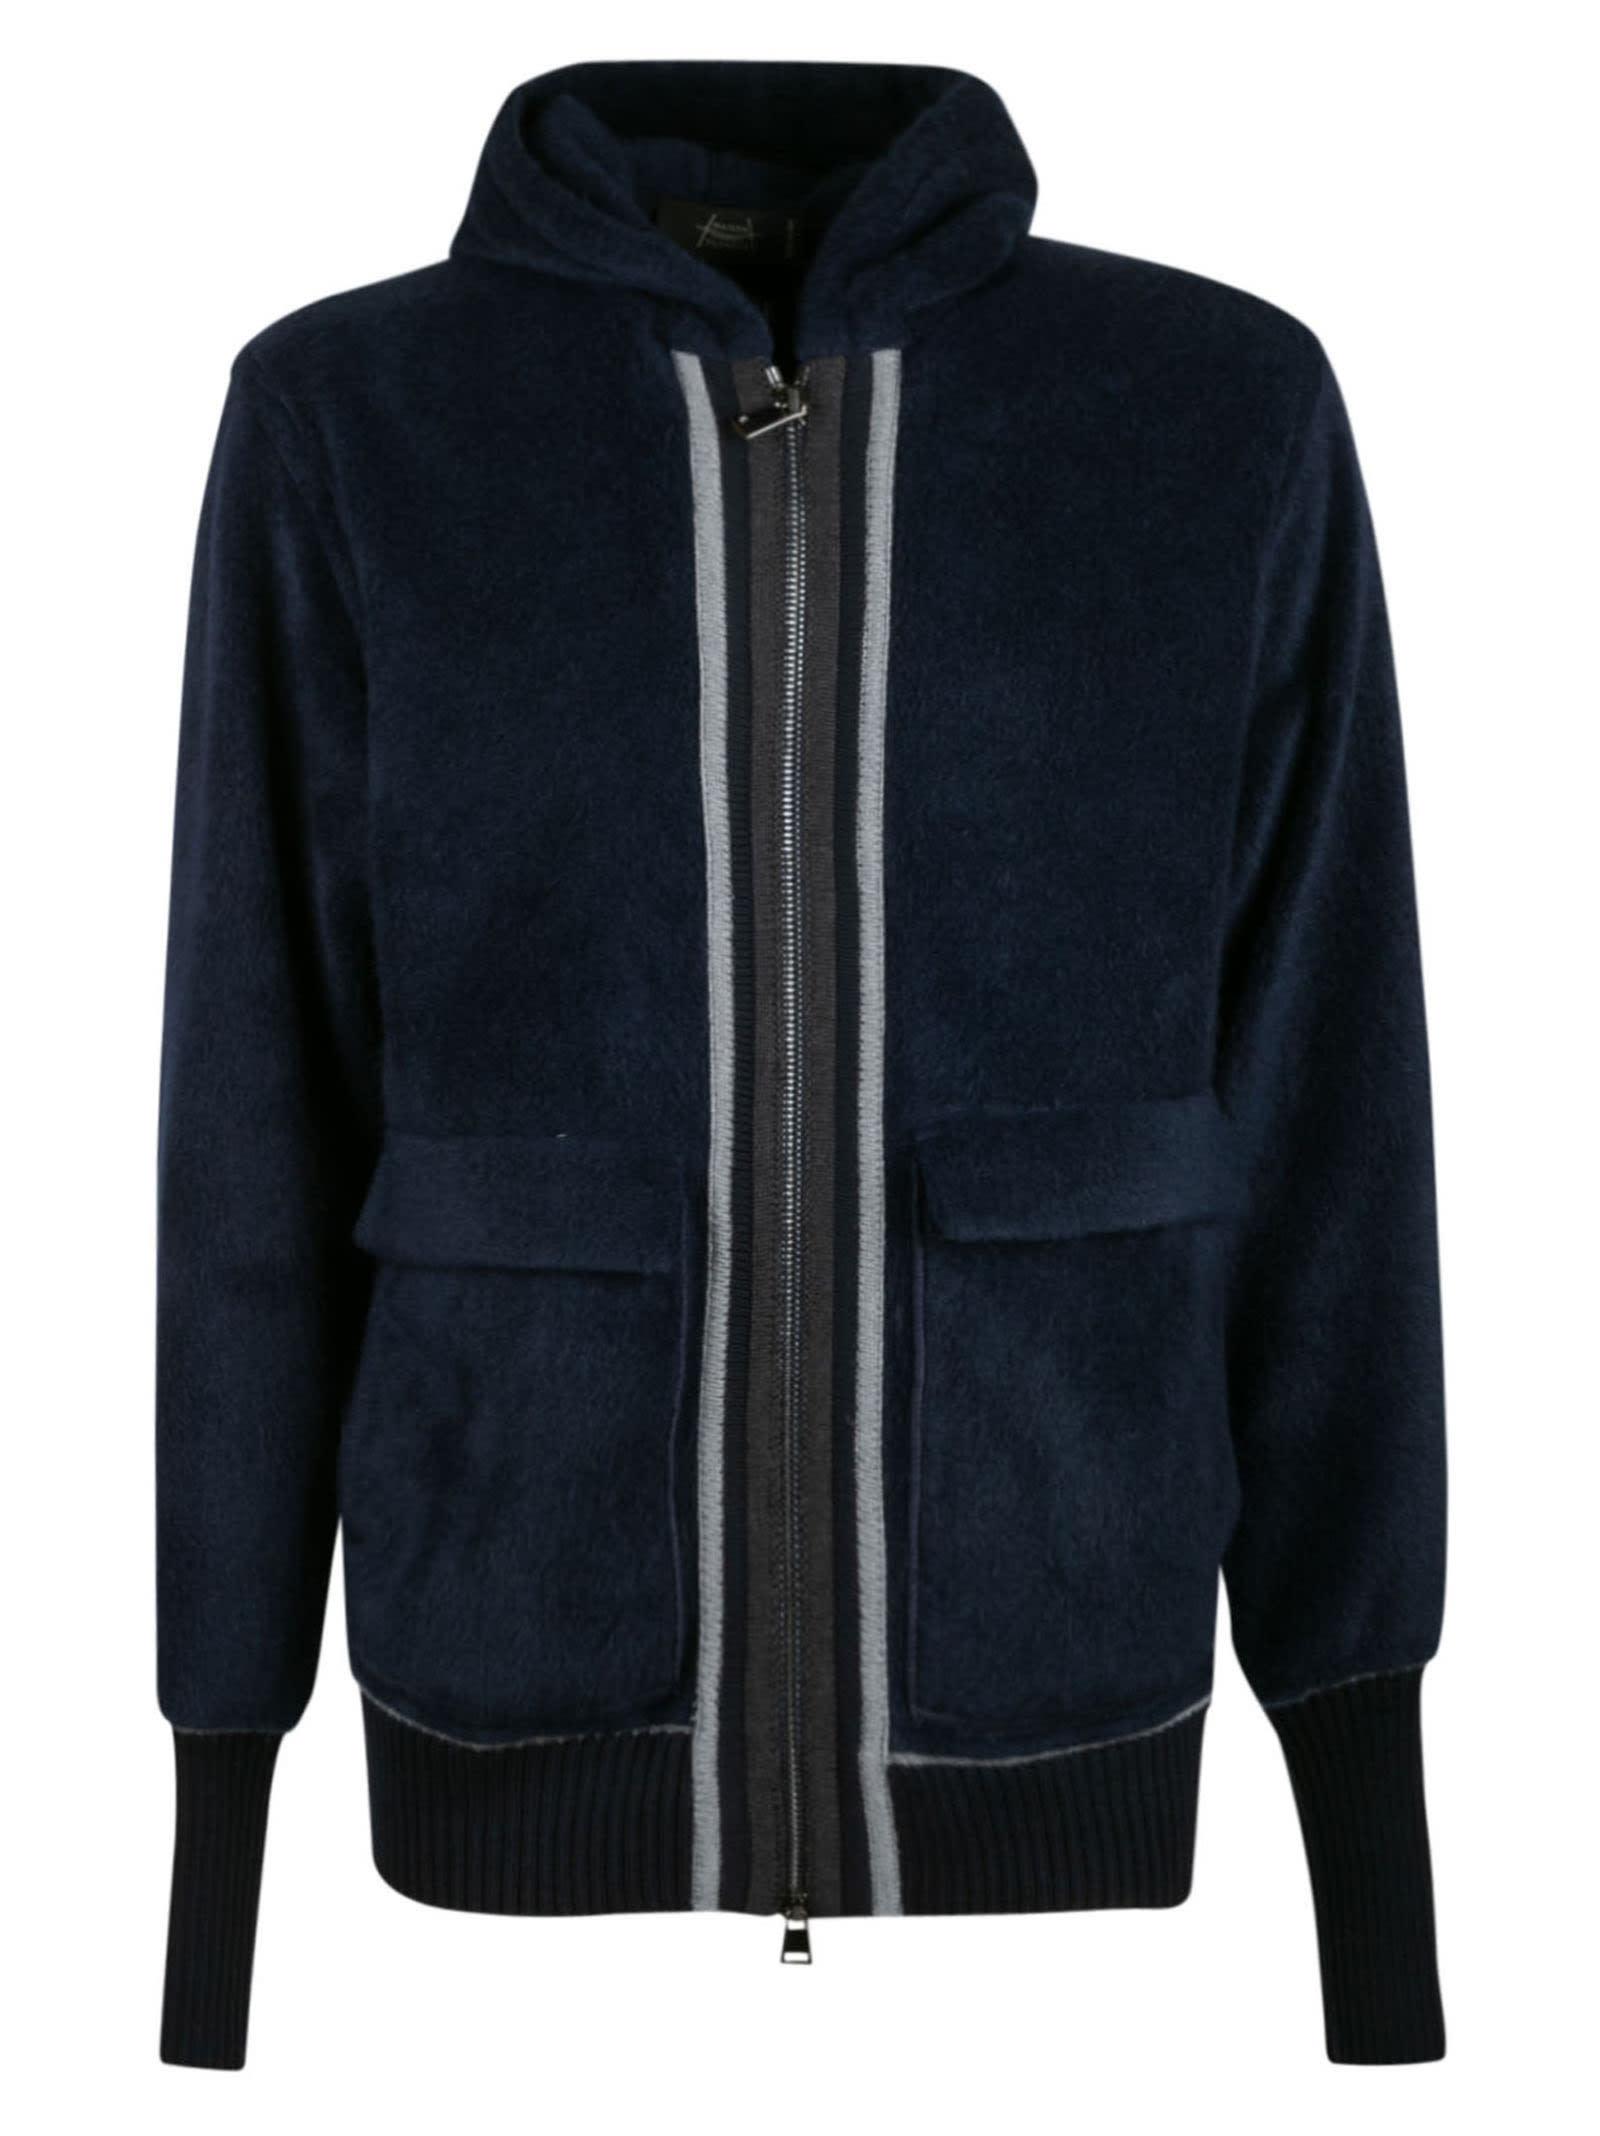 Patch Pocket Hooded Zip Jacket